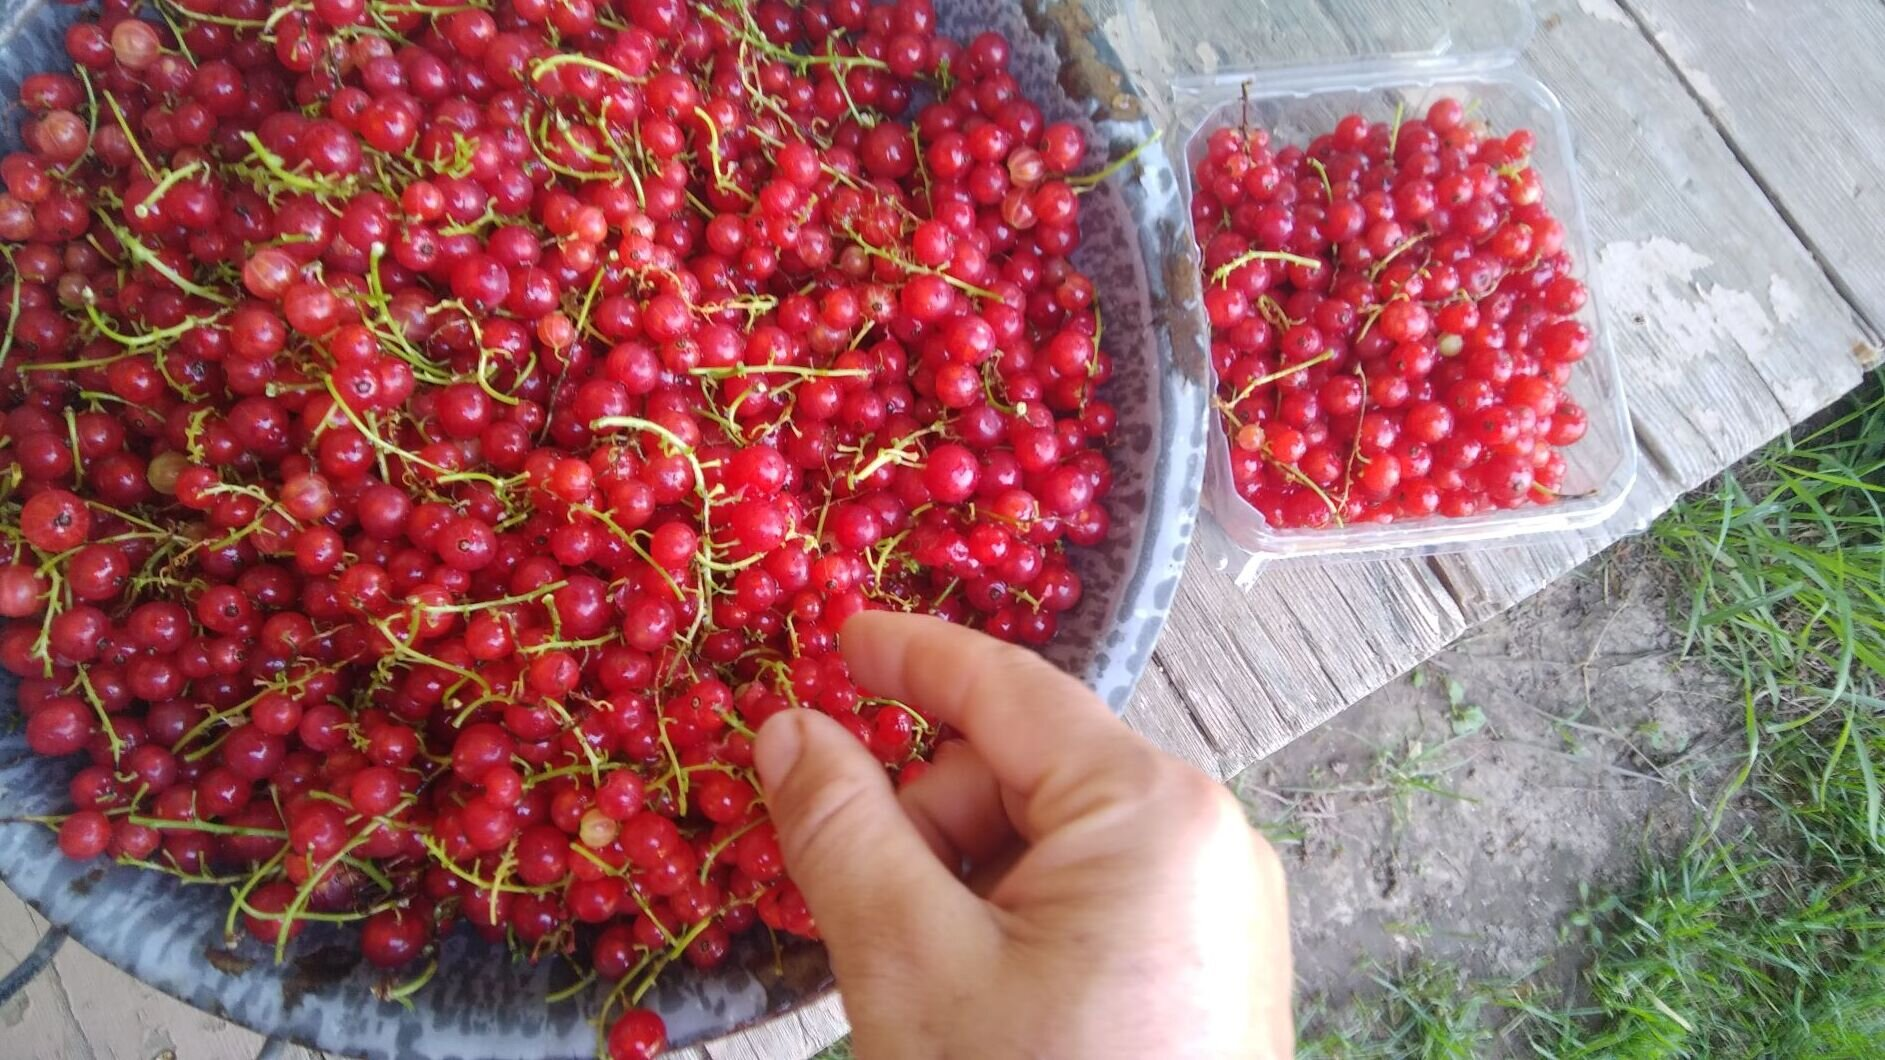 Red currant harvest sampler. Photo by Erin Schneider